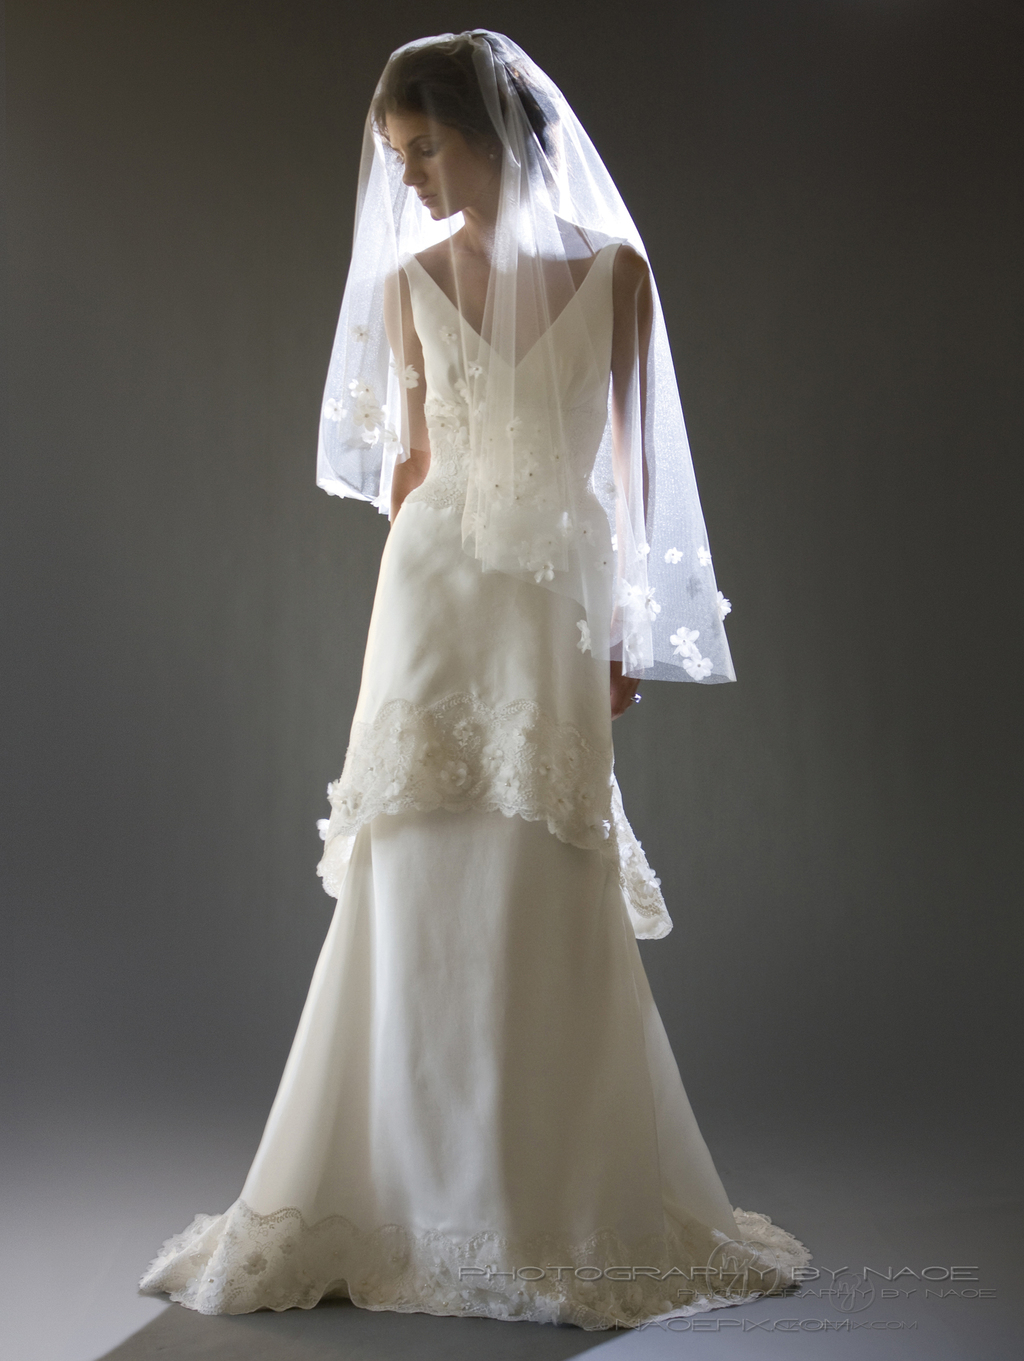 Wedding-dress-spring-2013-bridal_gown-cocoe-voci-7-veil.full